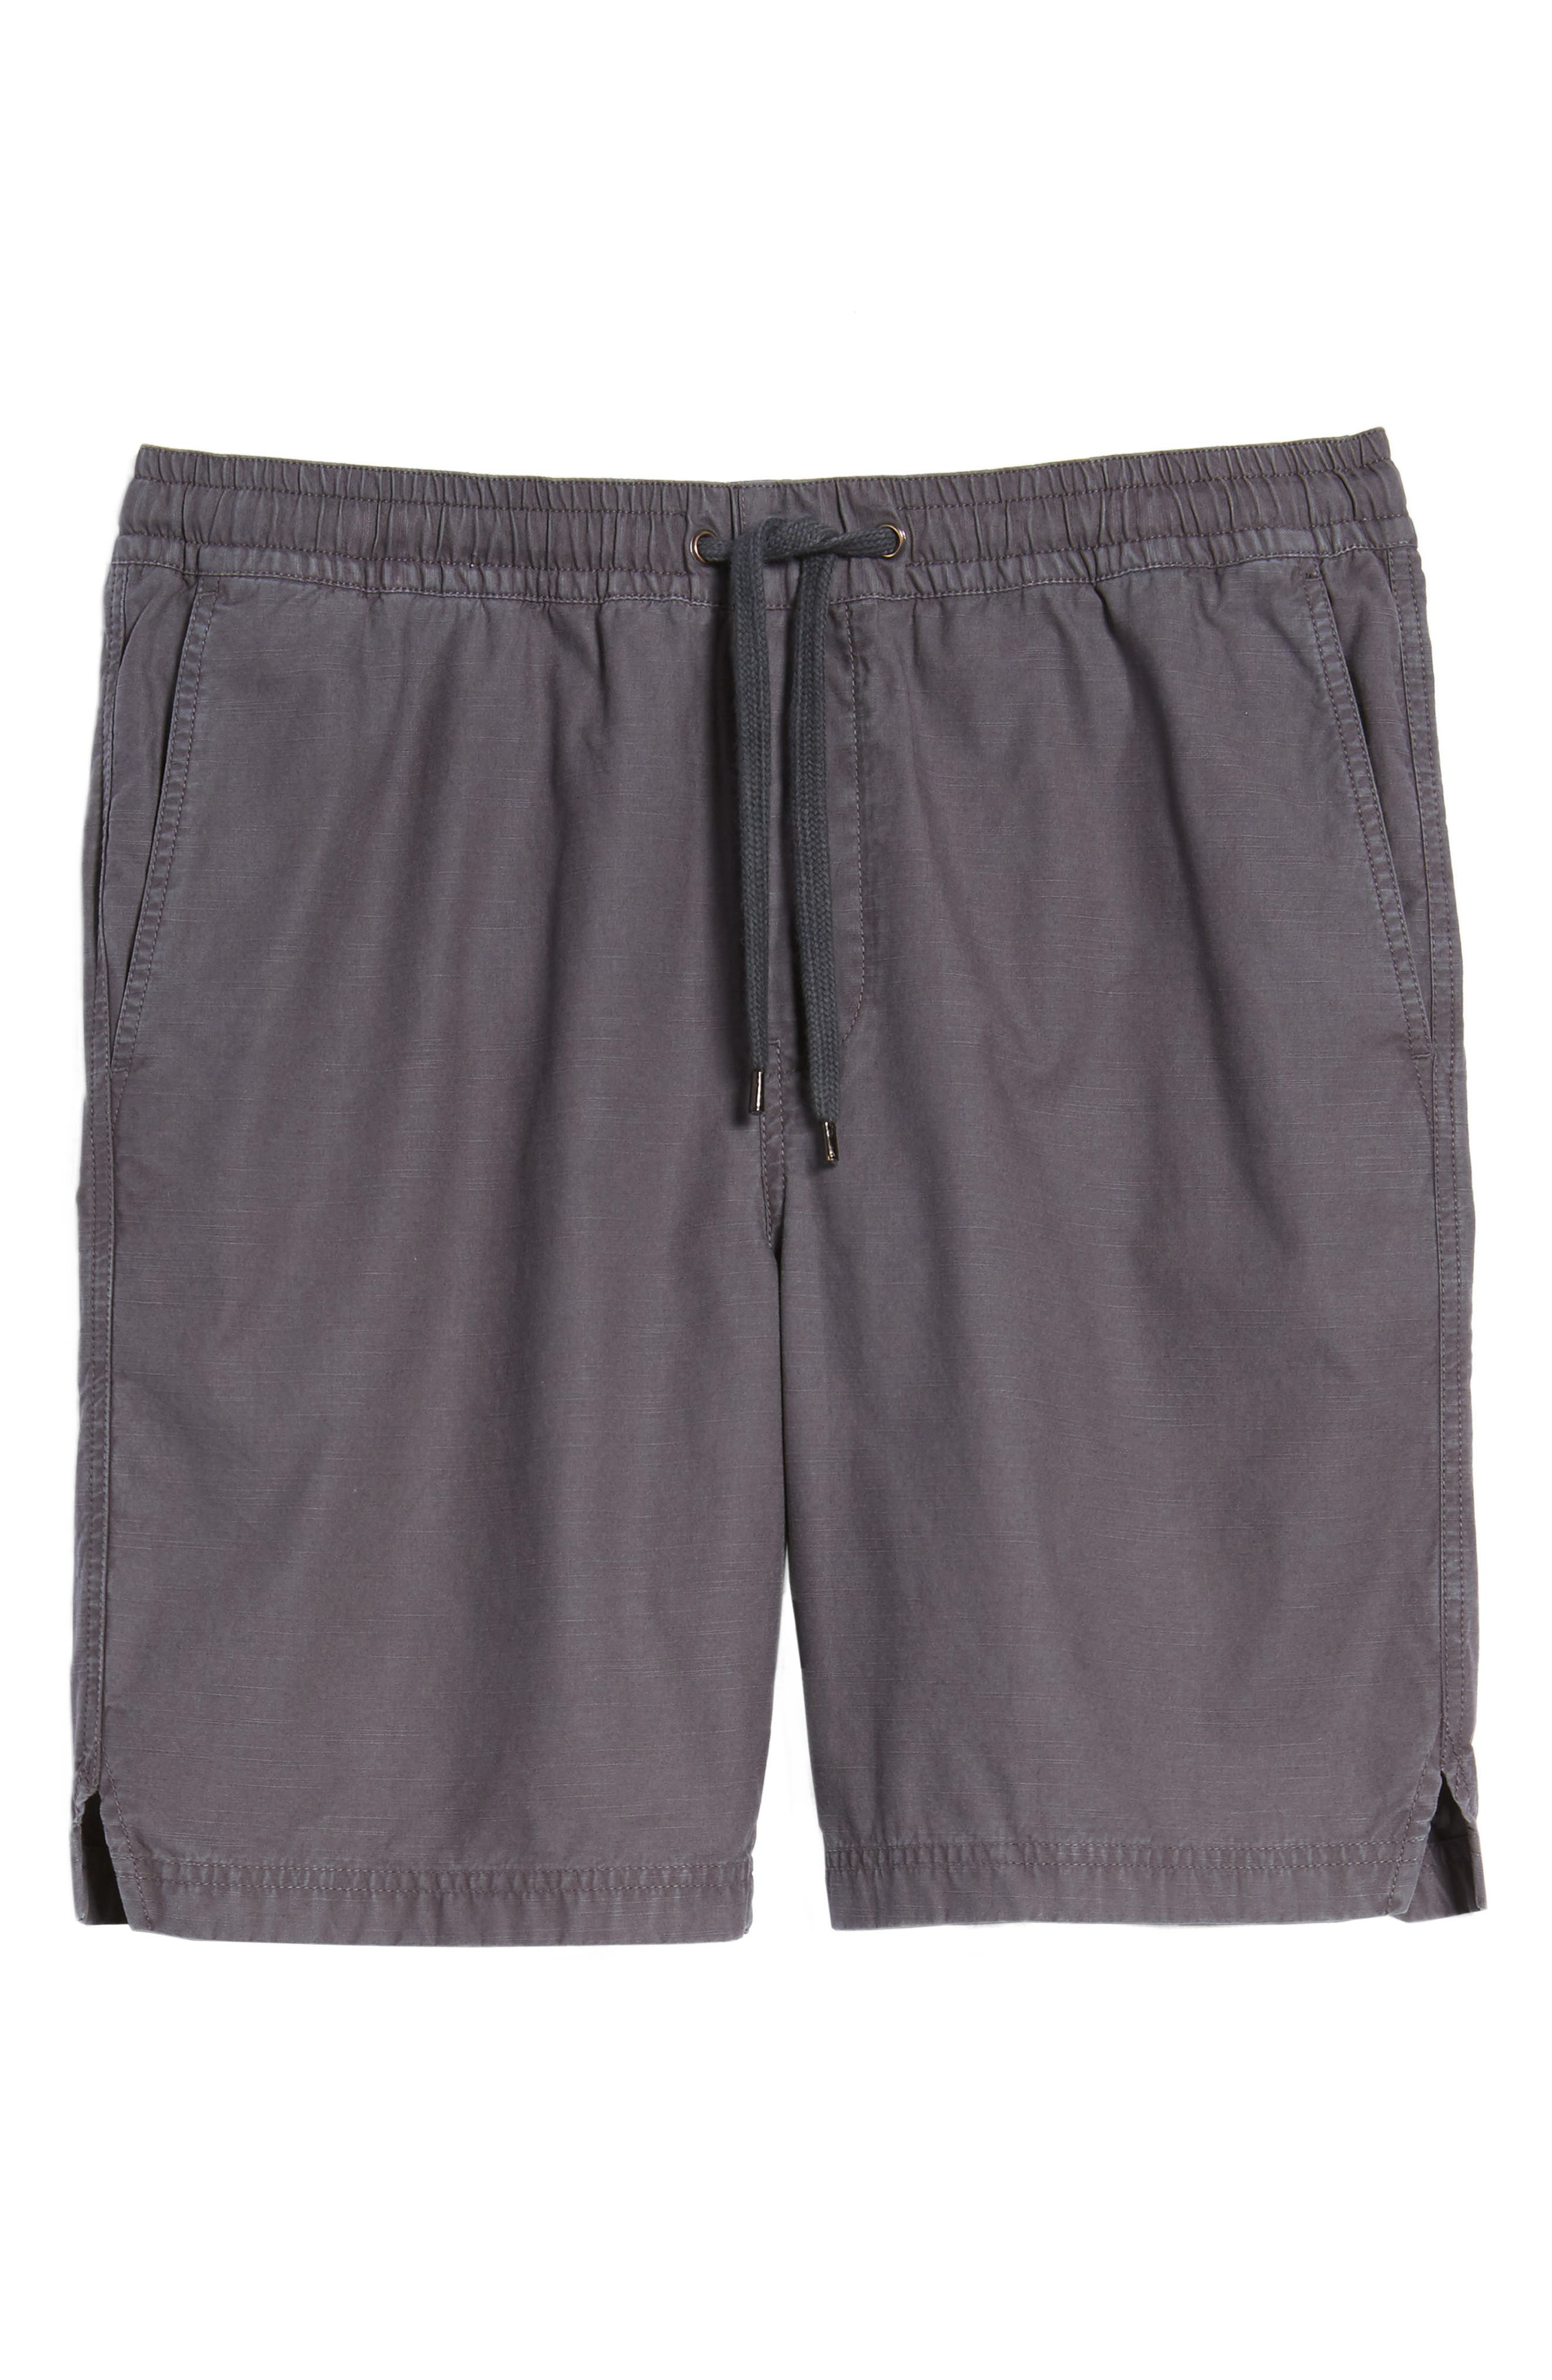 E-Waist Utility Shorts,                             Alternate thumbnail 6, color,                             021